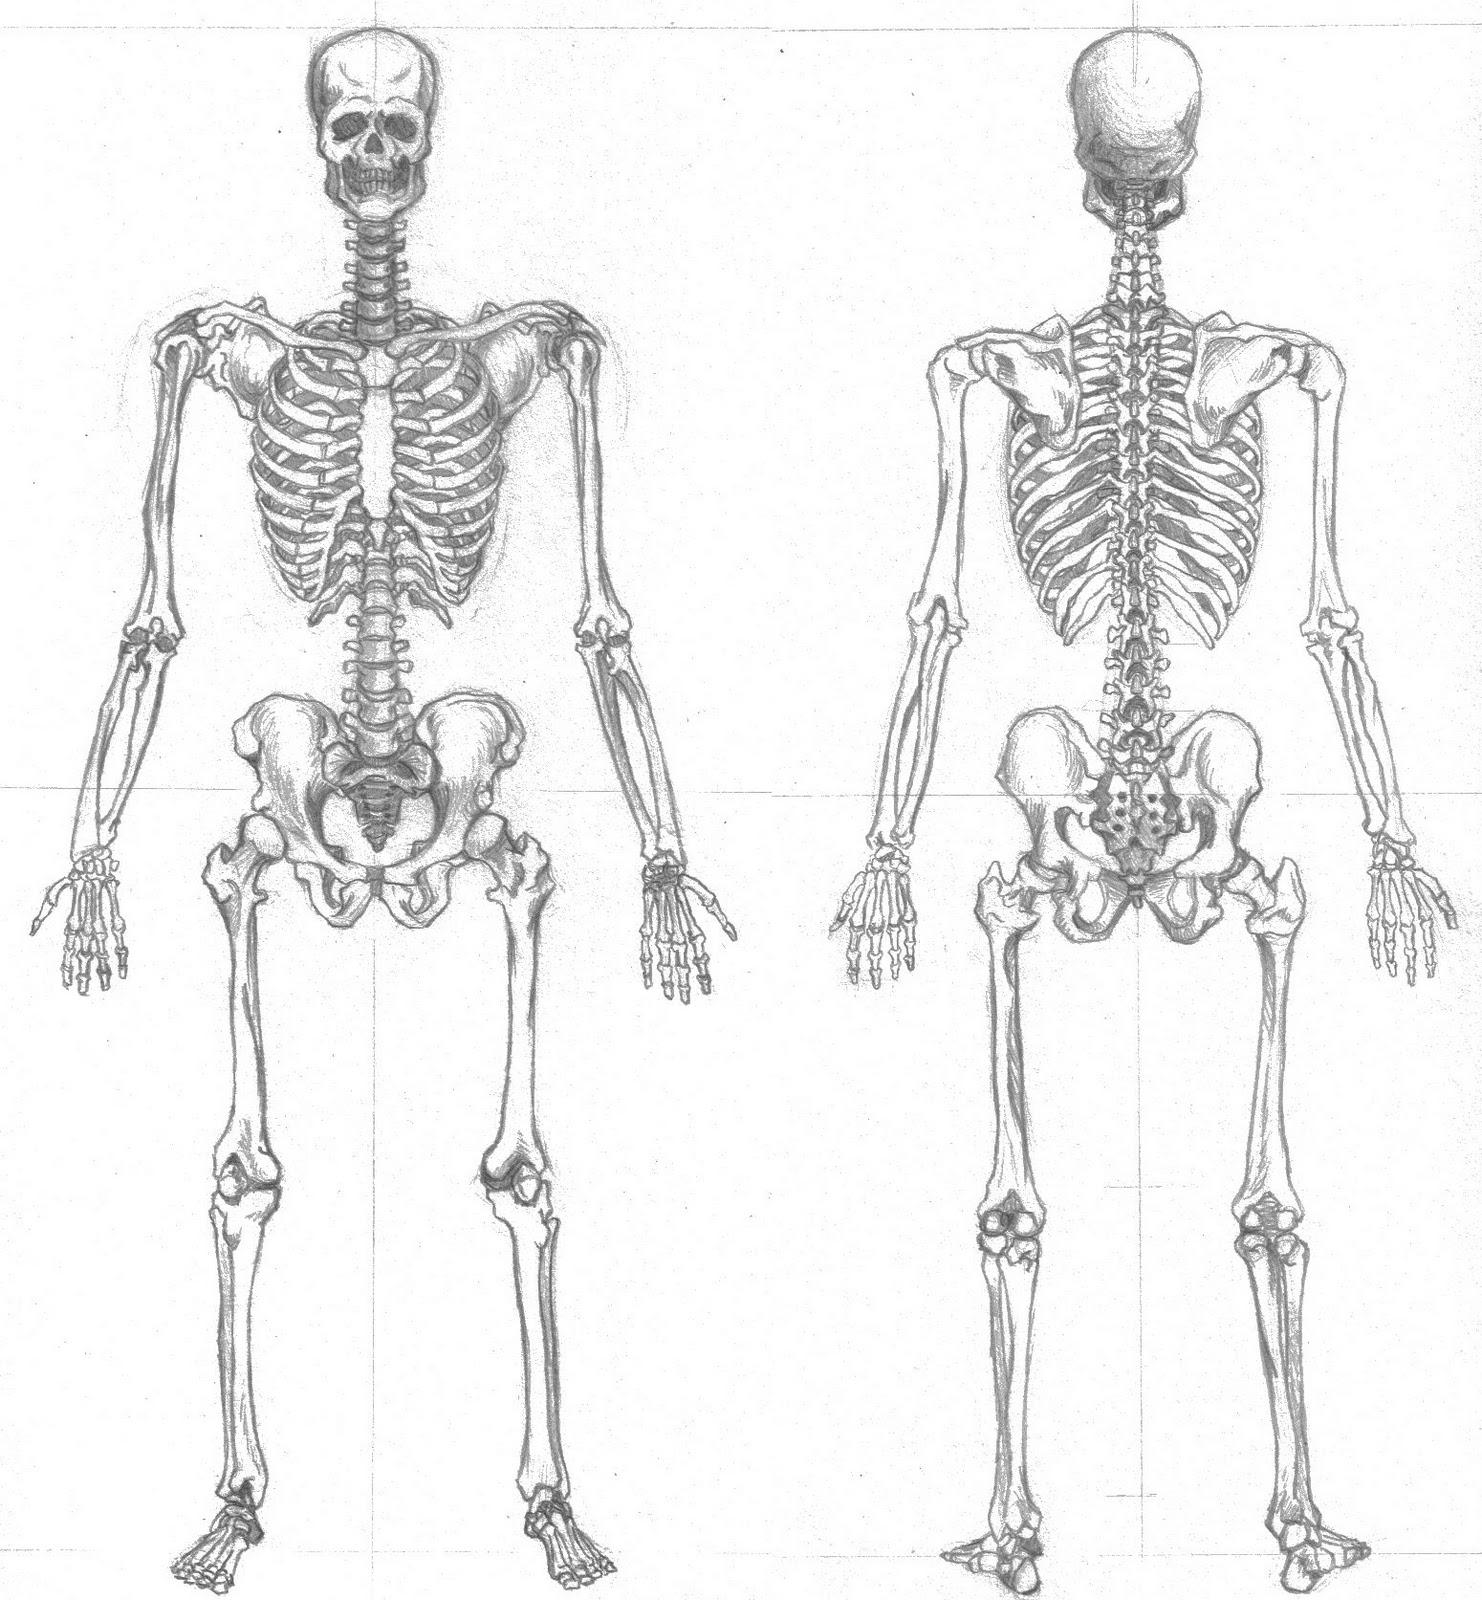 David Vázquez Guerrero: 9zeros: Dibujo Ilustrativo (Anatomía Humana)